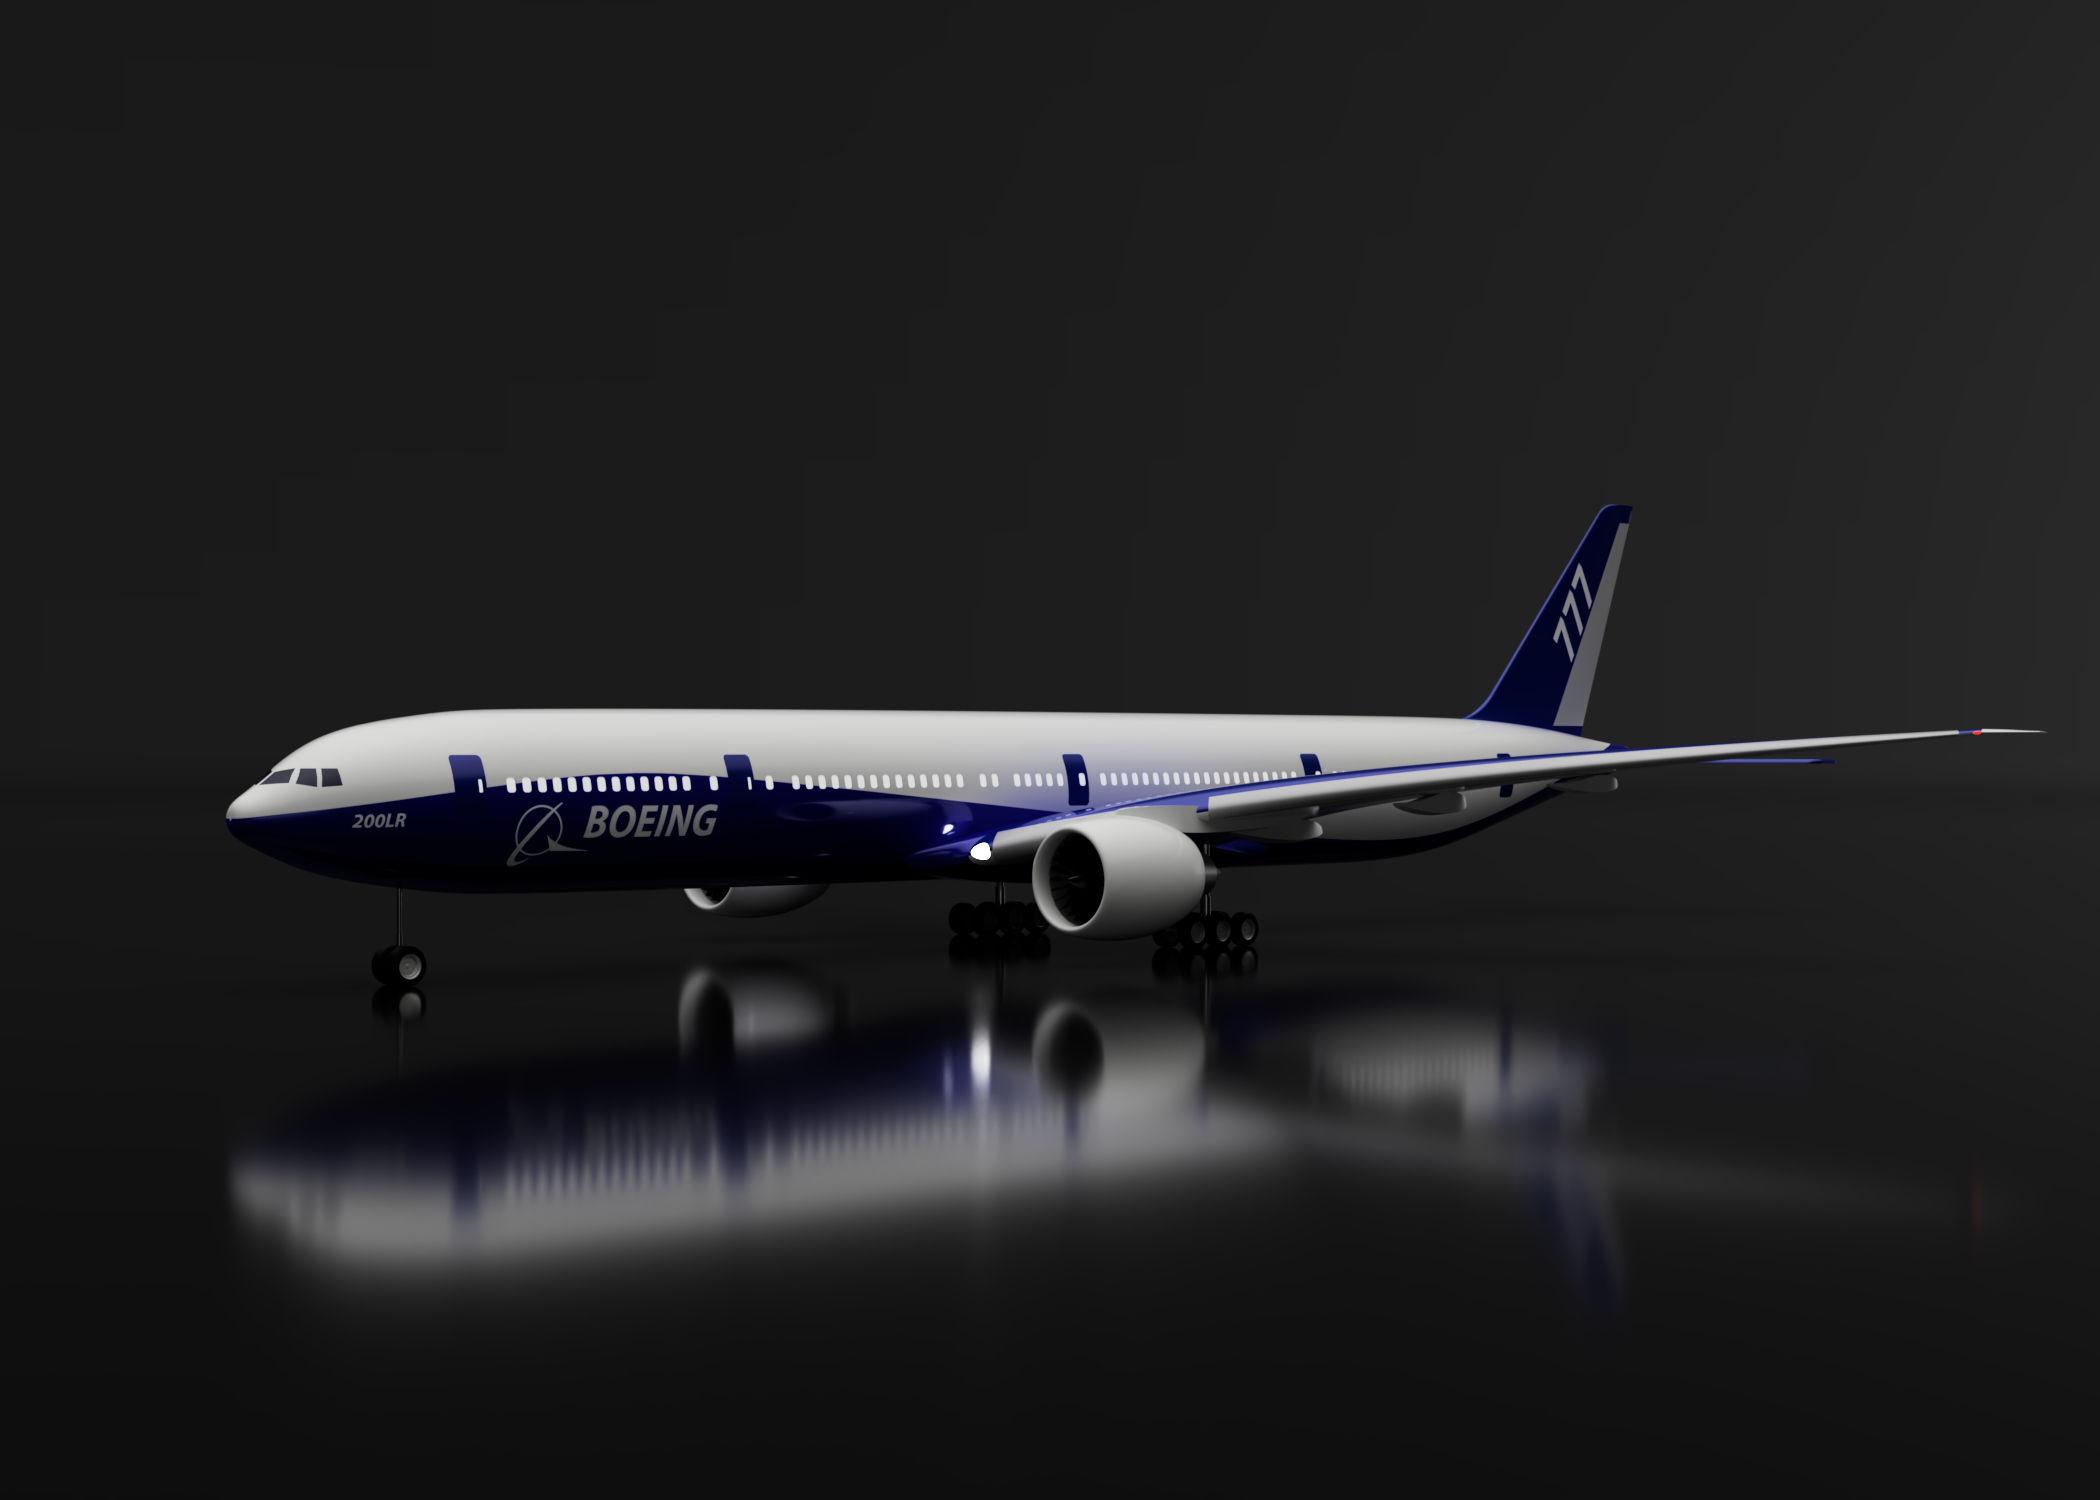 Aeroplane-2018-jun-05-09-16-13am-000-customizedview38722620336-jpg-3500-3500